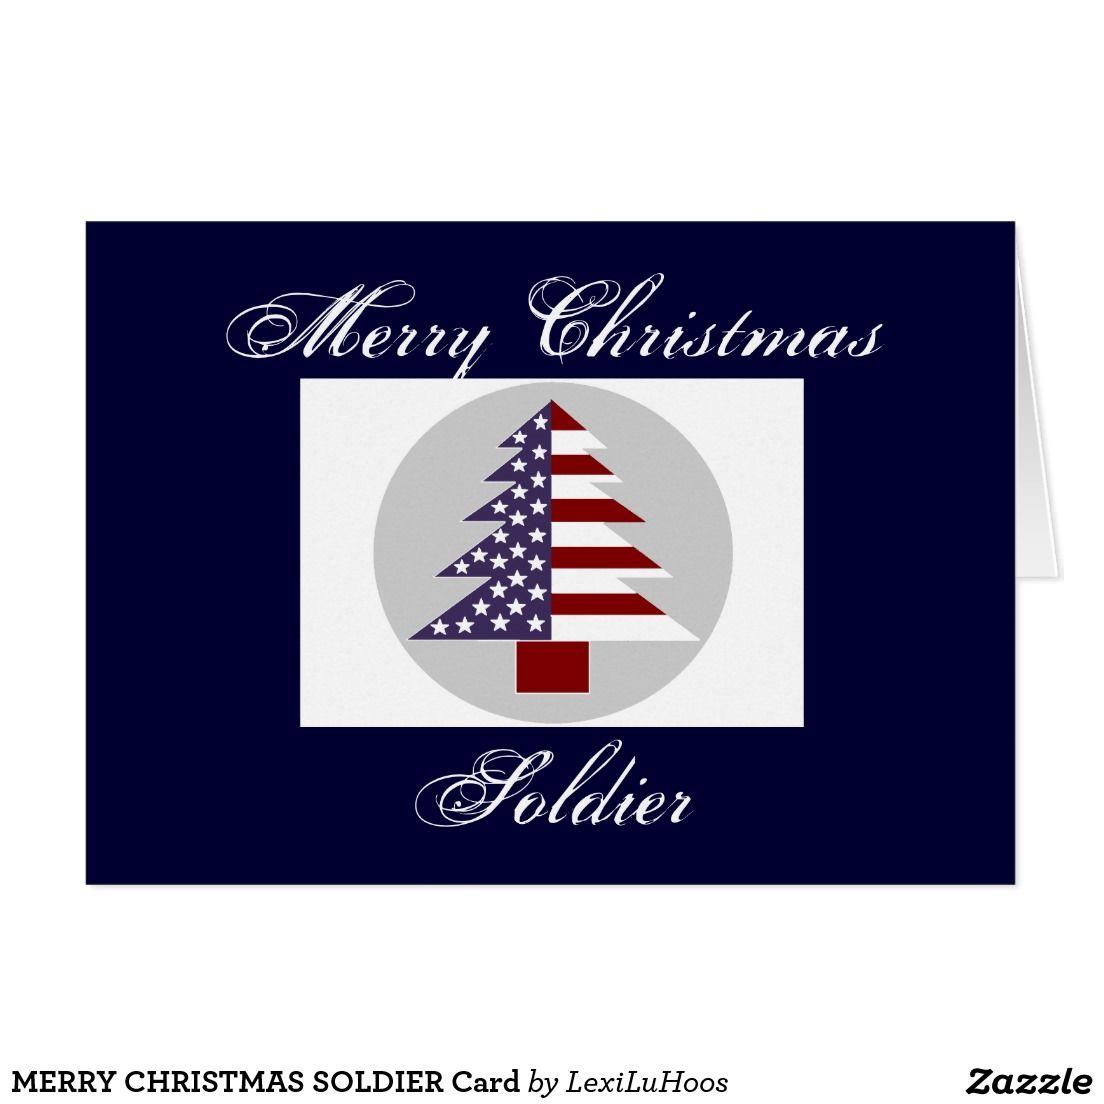 MERRY CHRISTMAS SOLDIER Card   zazz   Pinterest   Merry